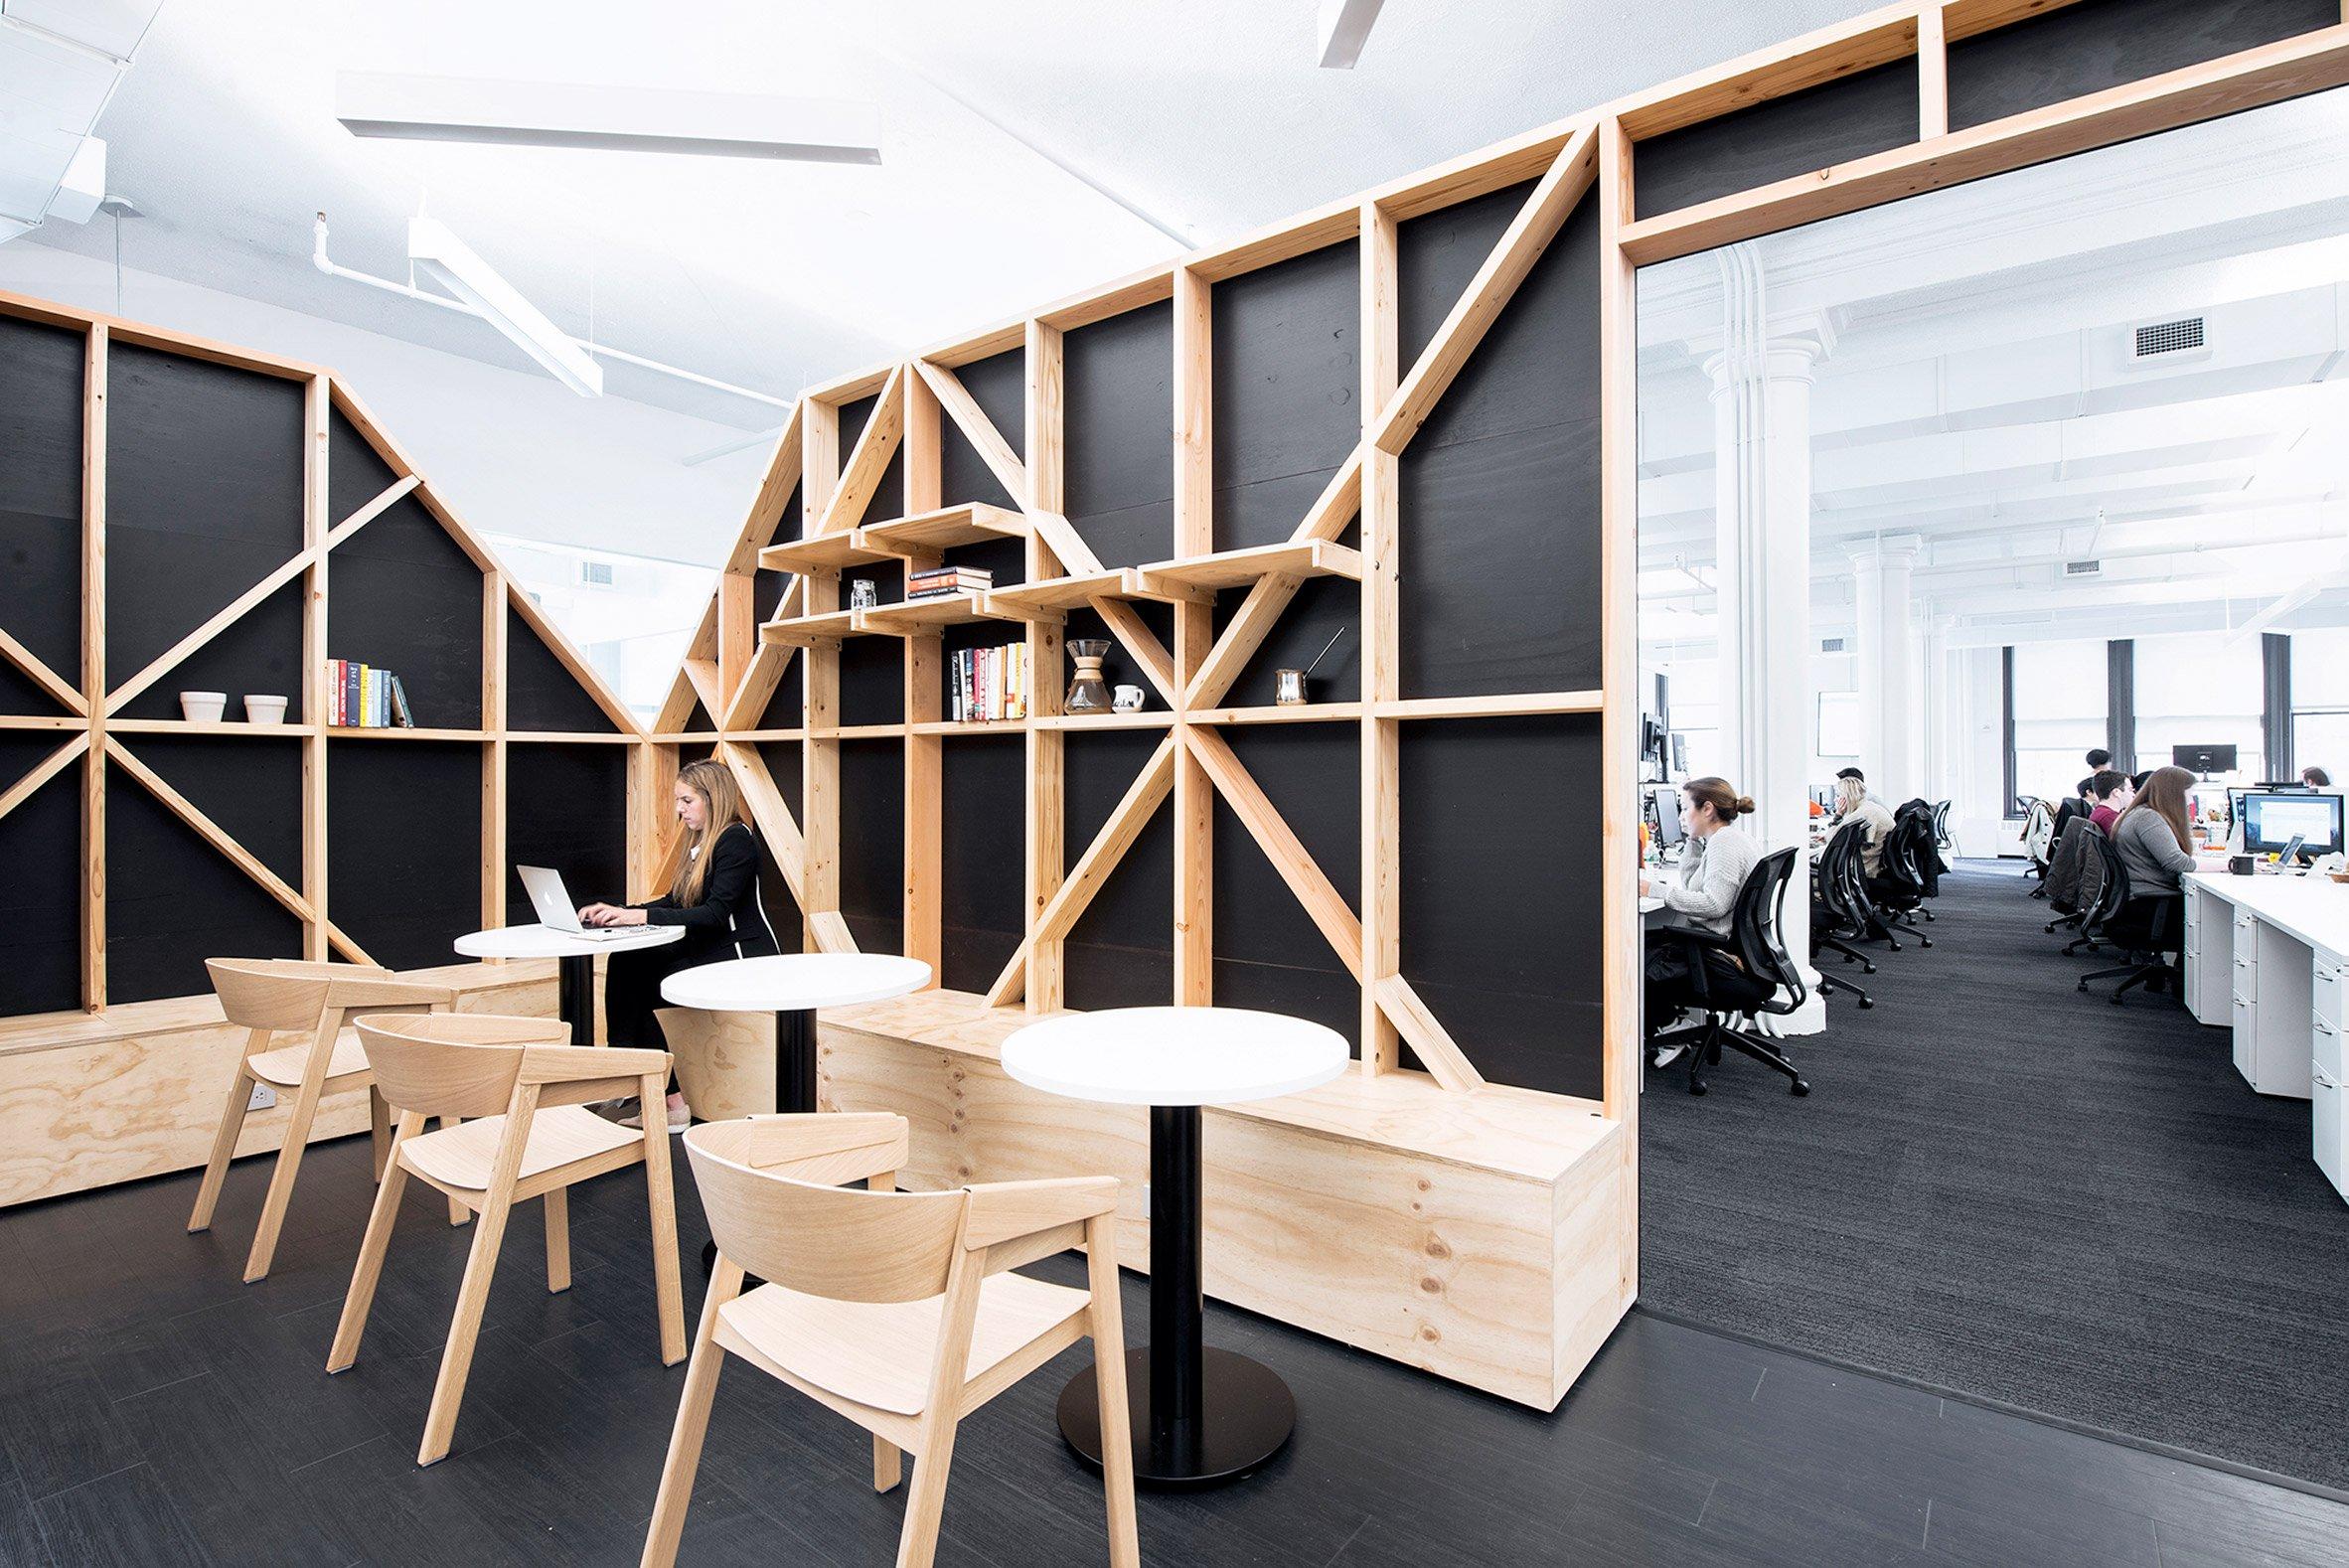 architecture-interiors-offices- manhatten-new-york-design-studia-osnovadesign-osnova-poltava_14